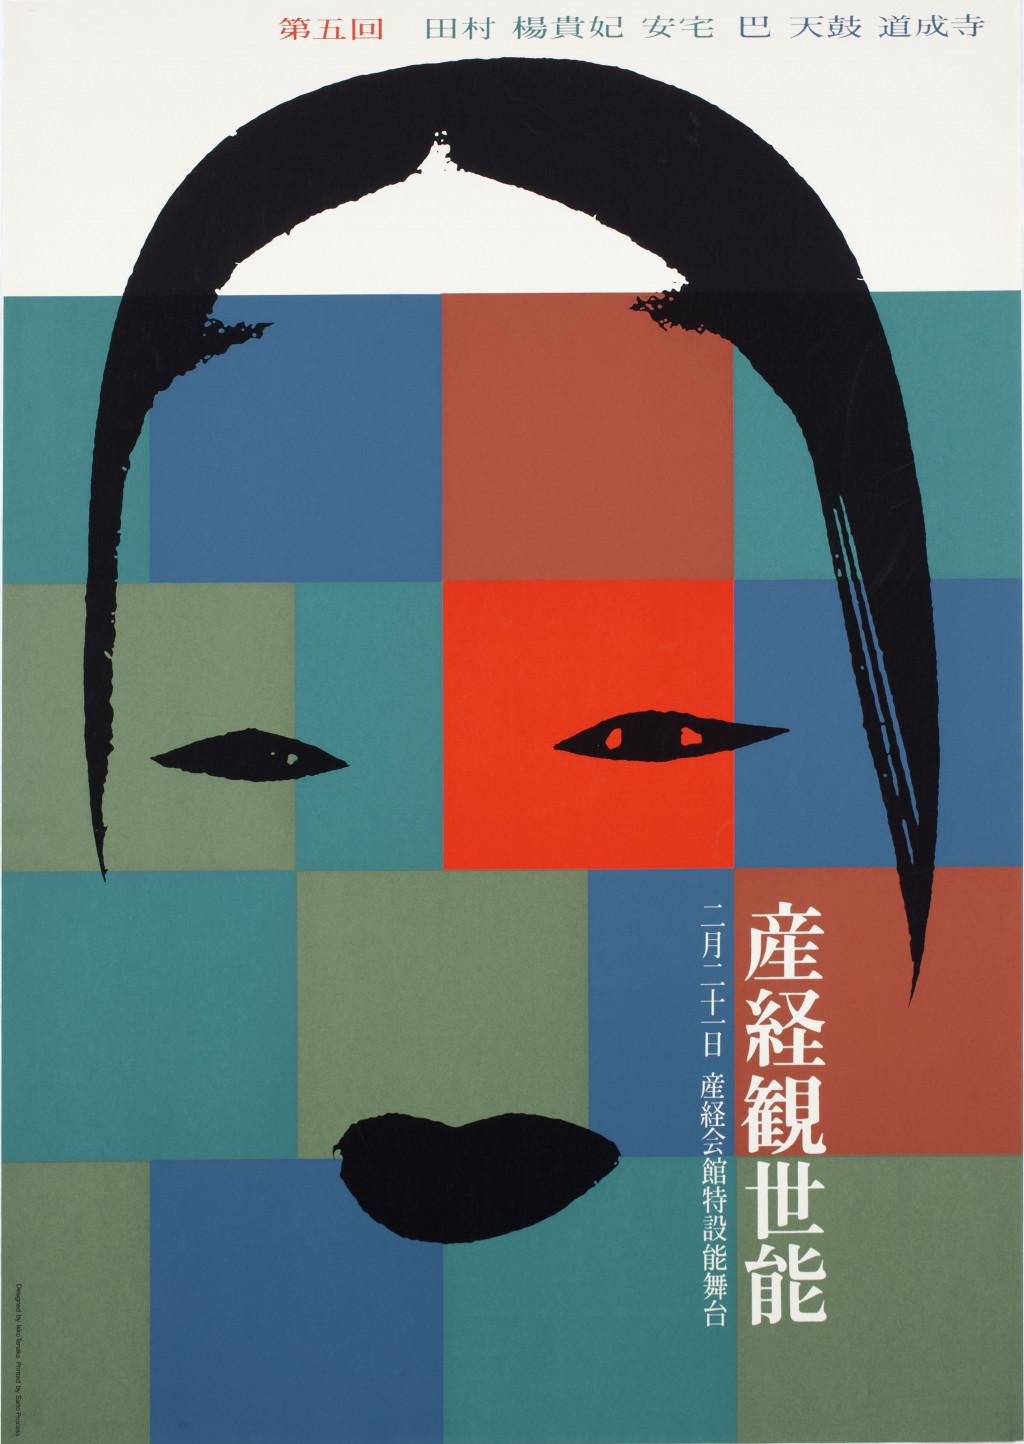 Ikko Tanaka, 'Noh Performance', 1958. Collection Stedelijk Museum Amsterdam